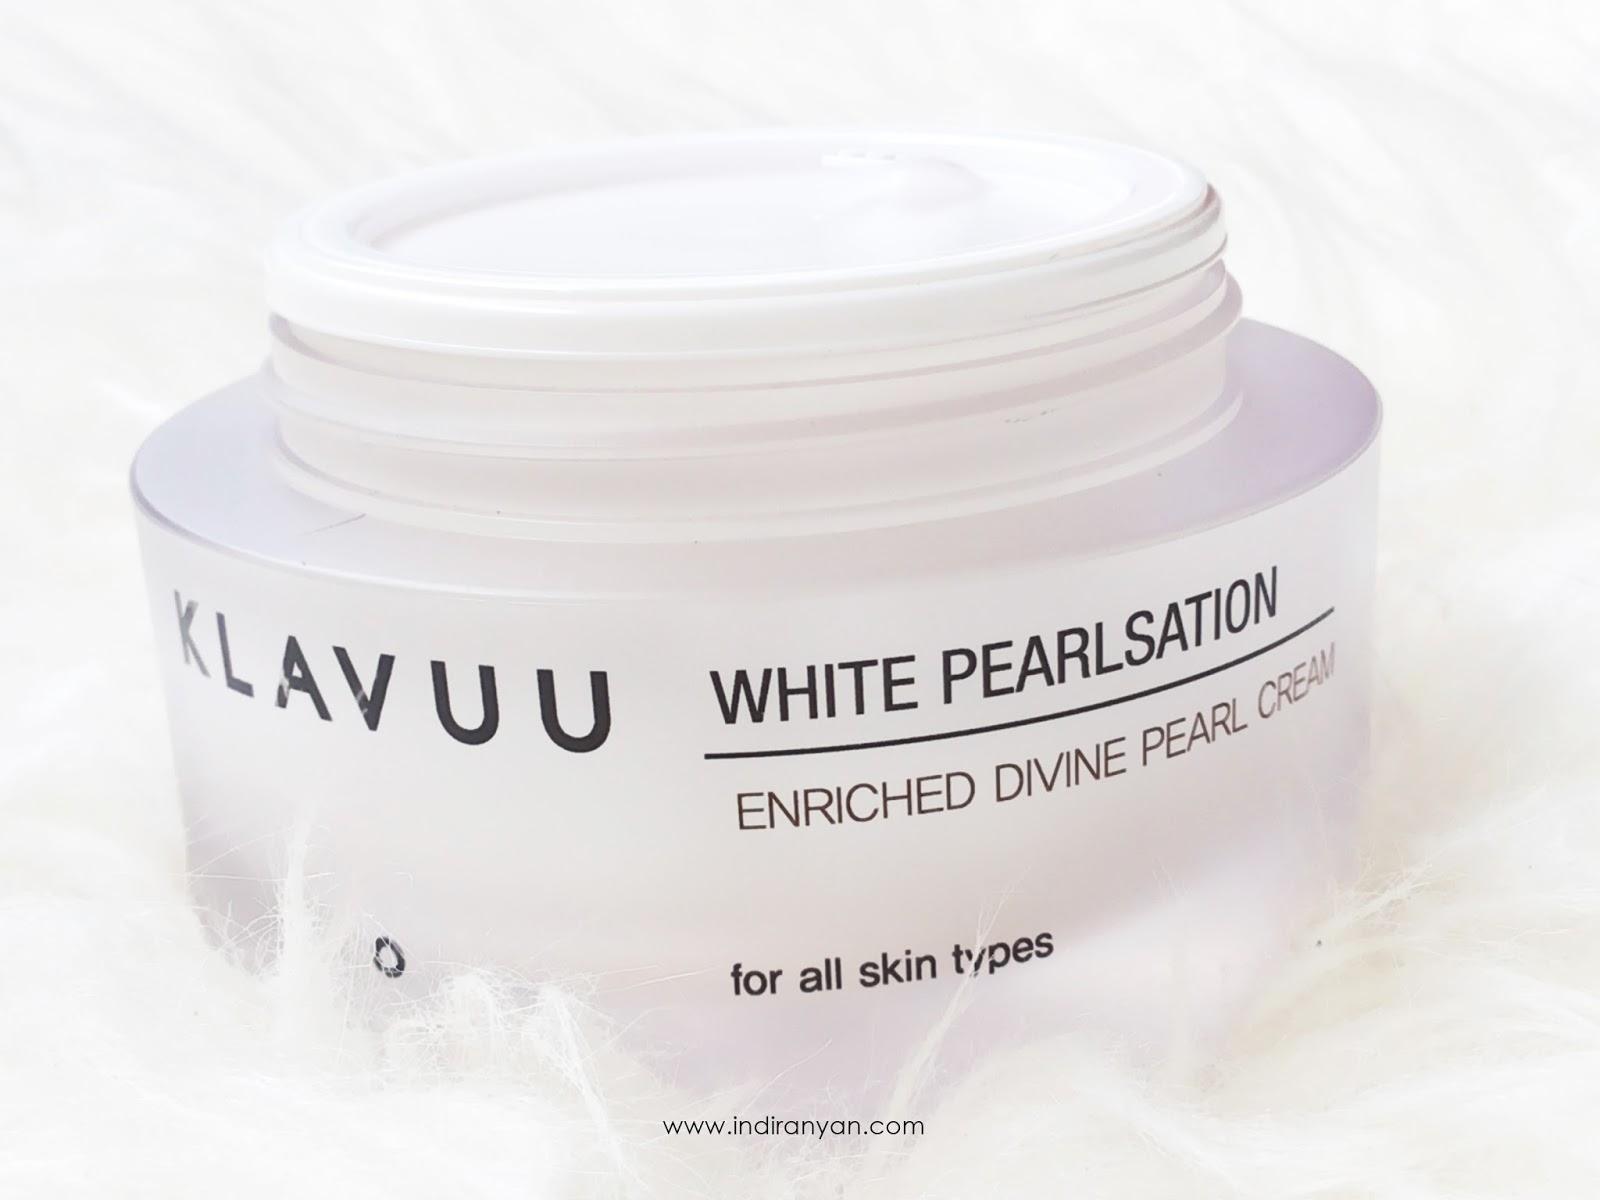 klavuu-white-pearlsation